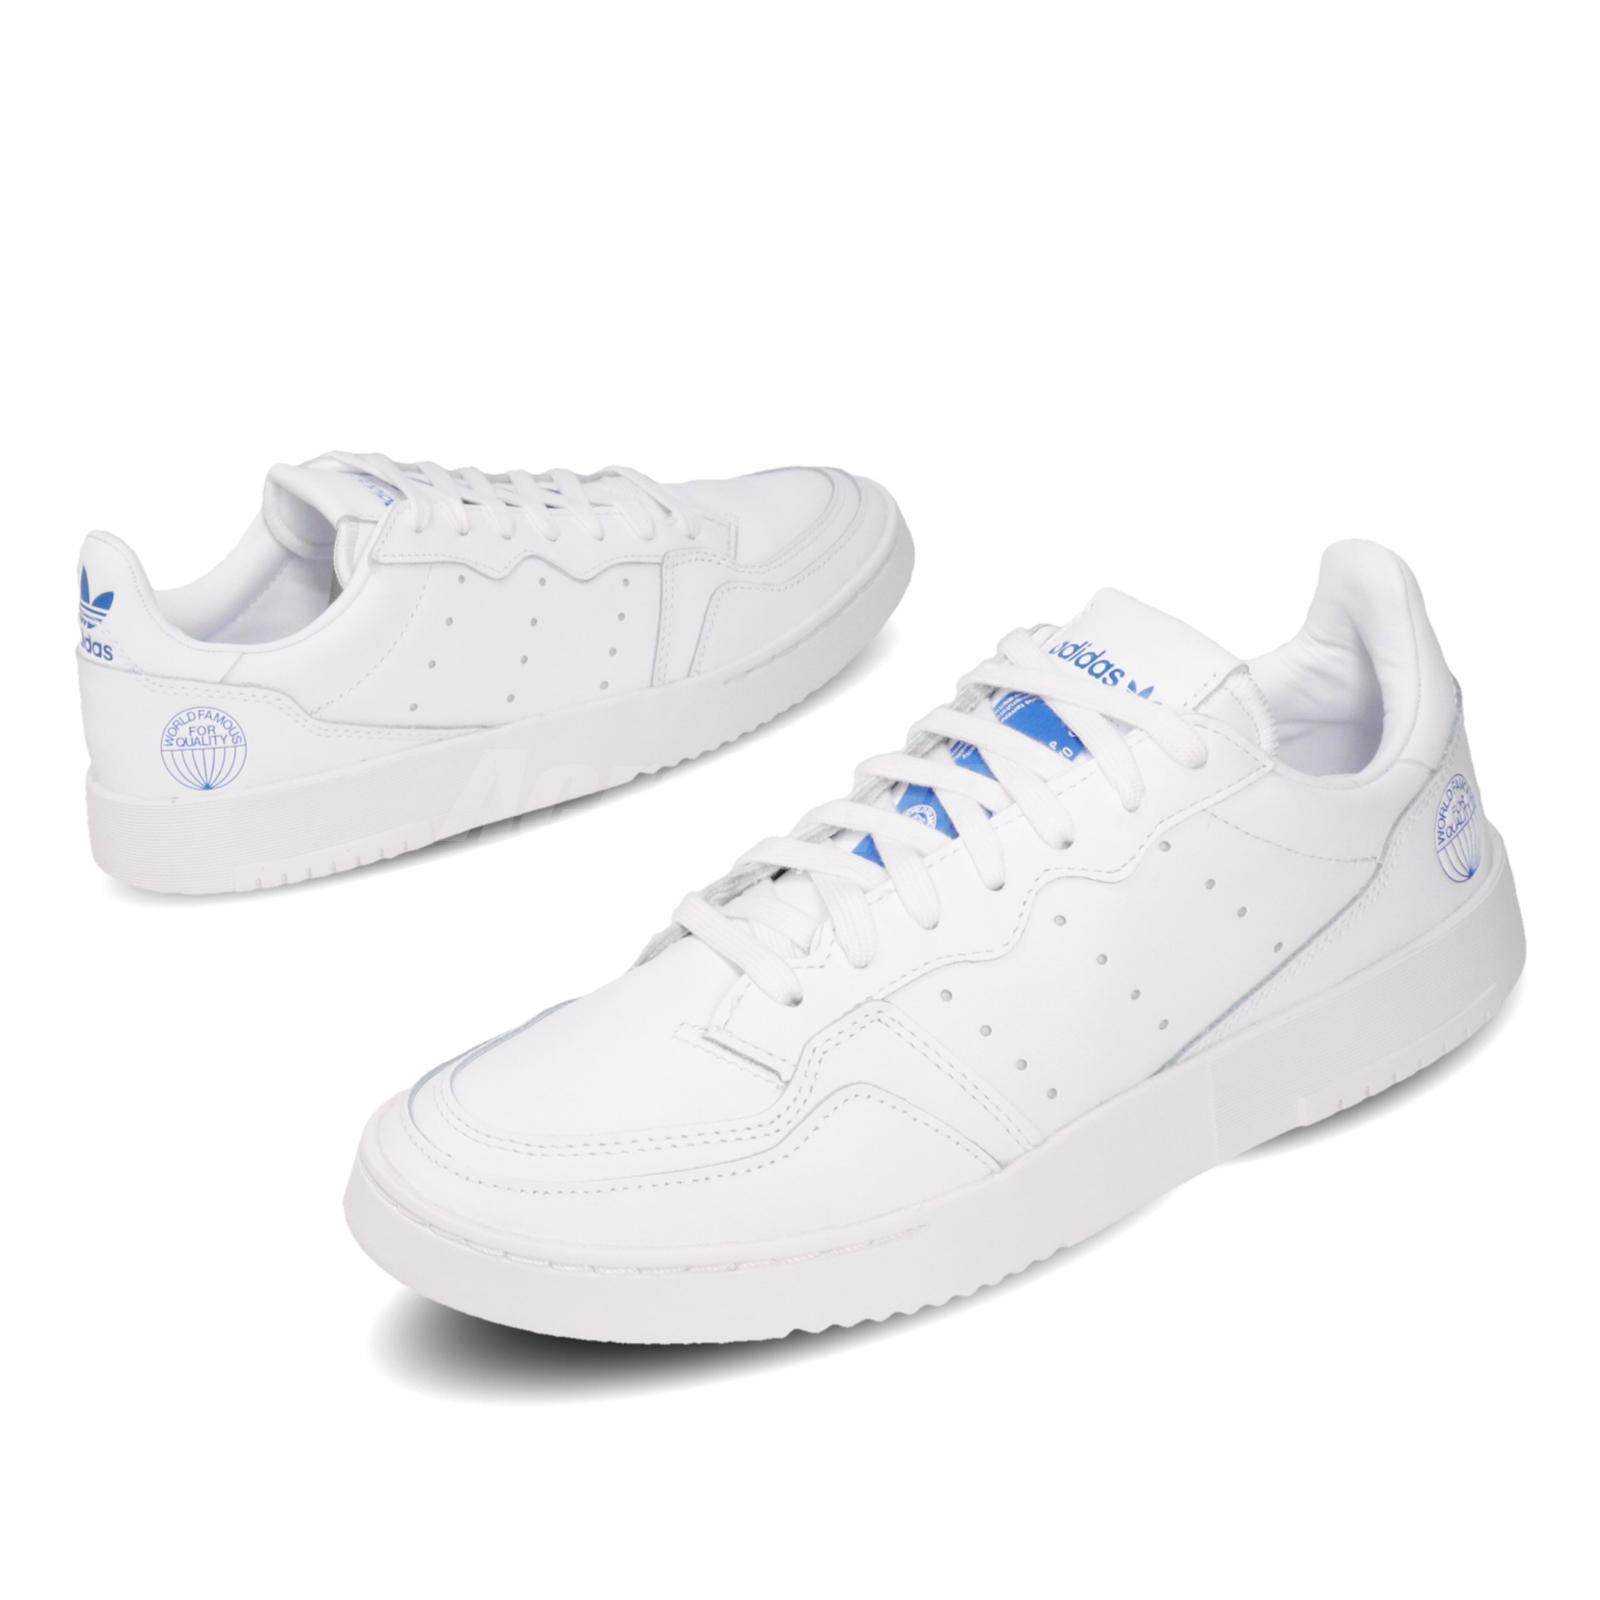 adidas Originals Supercourt World Famous For Quality White Blue ...